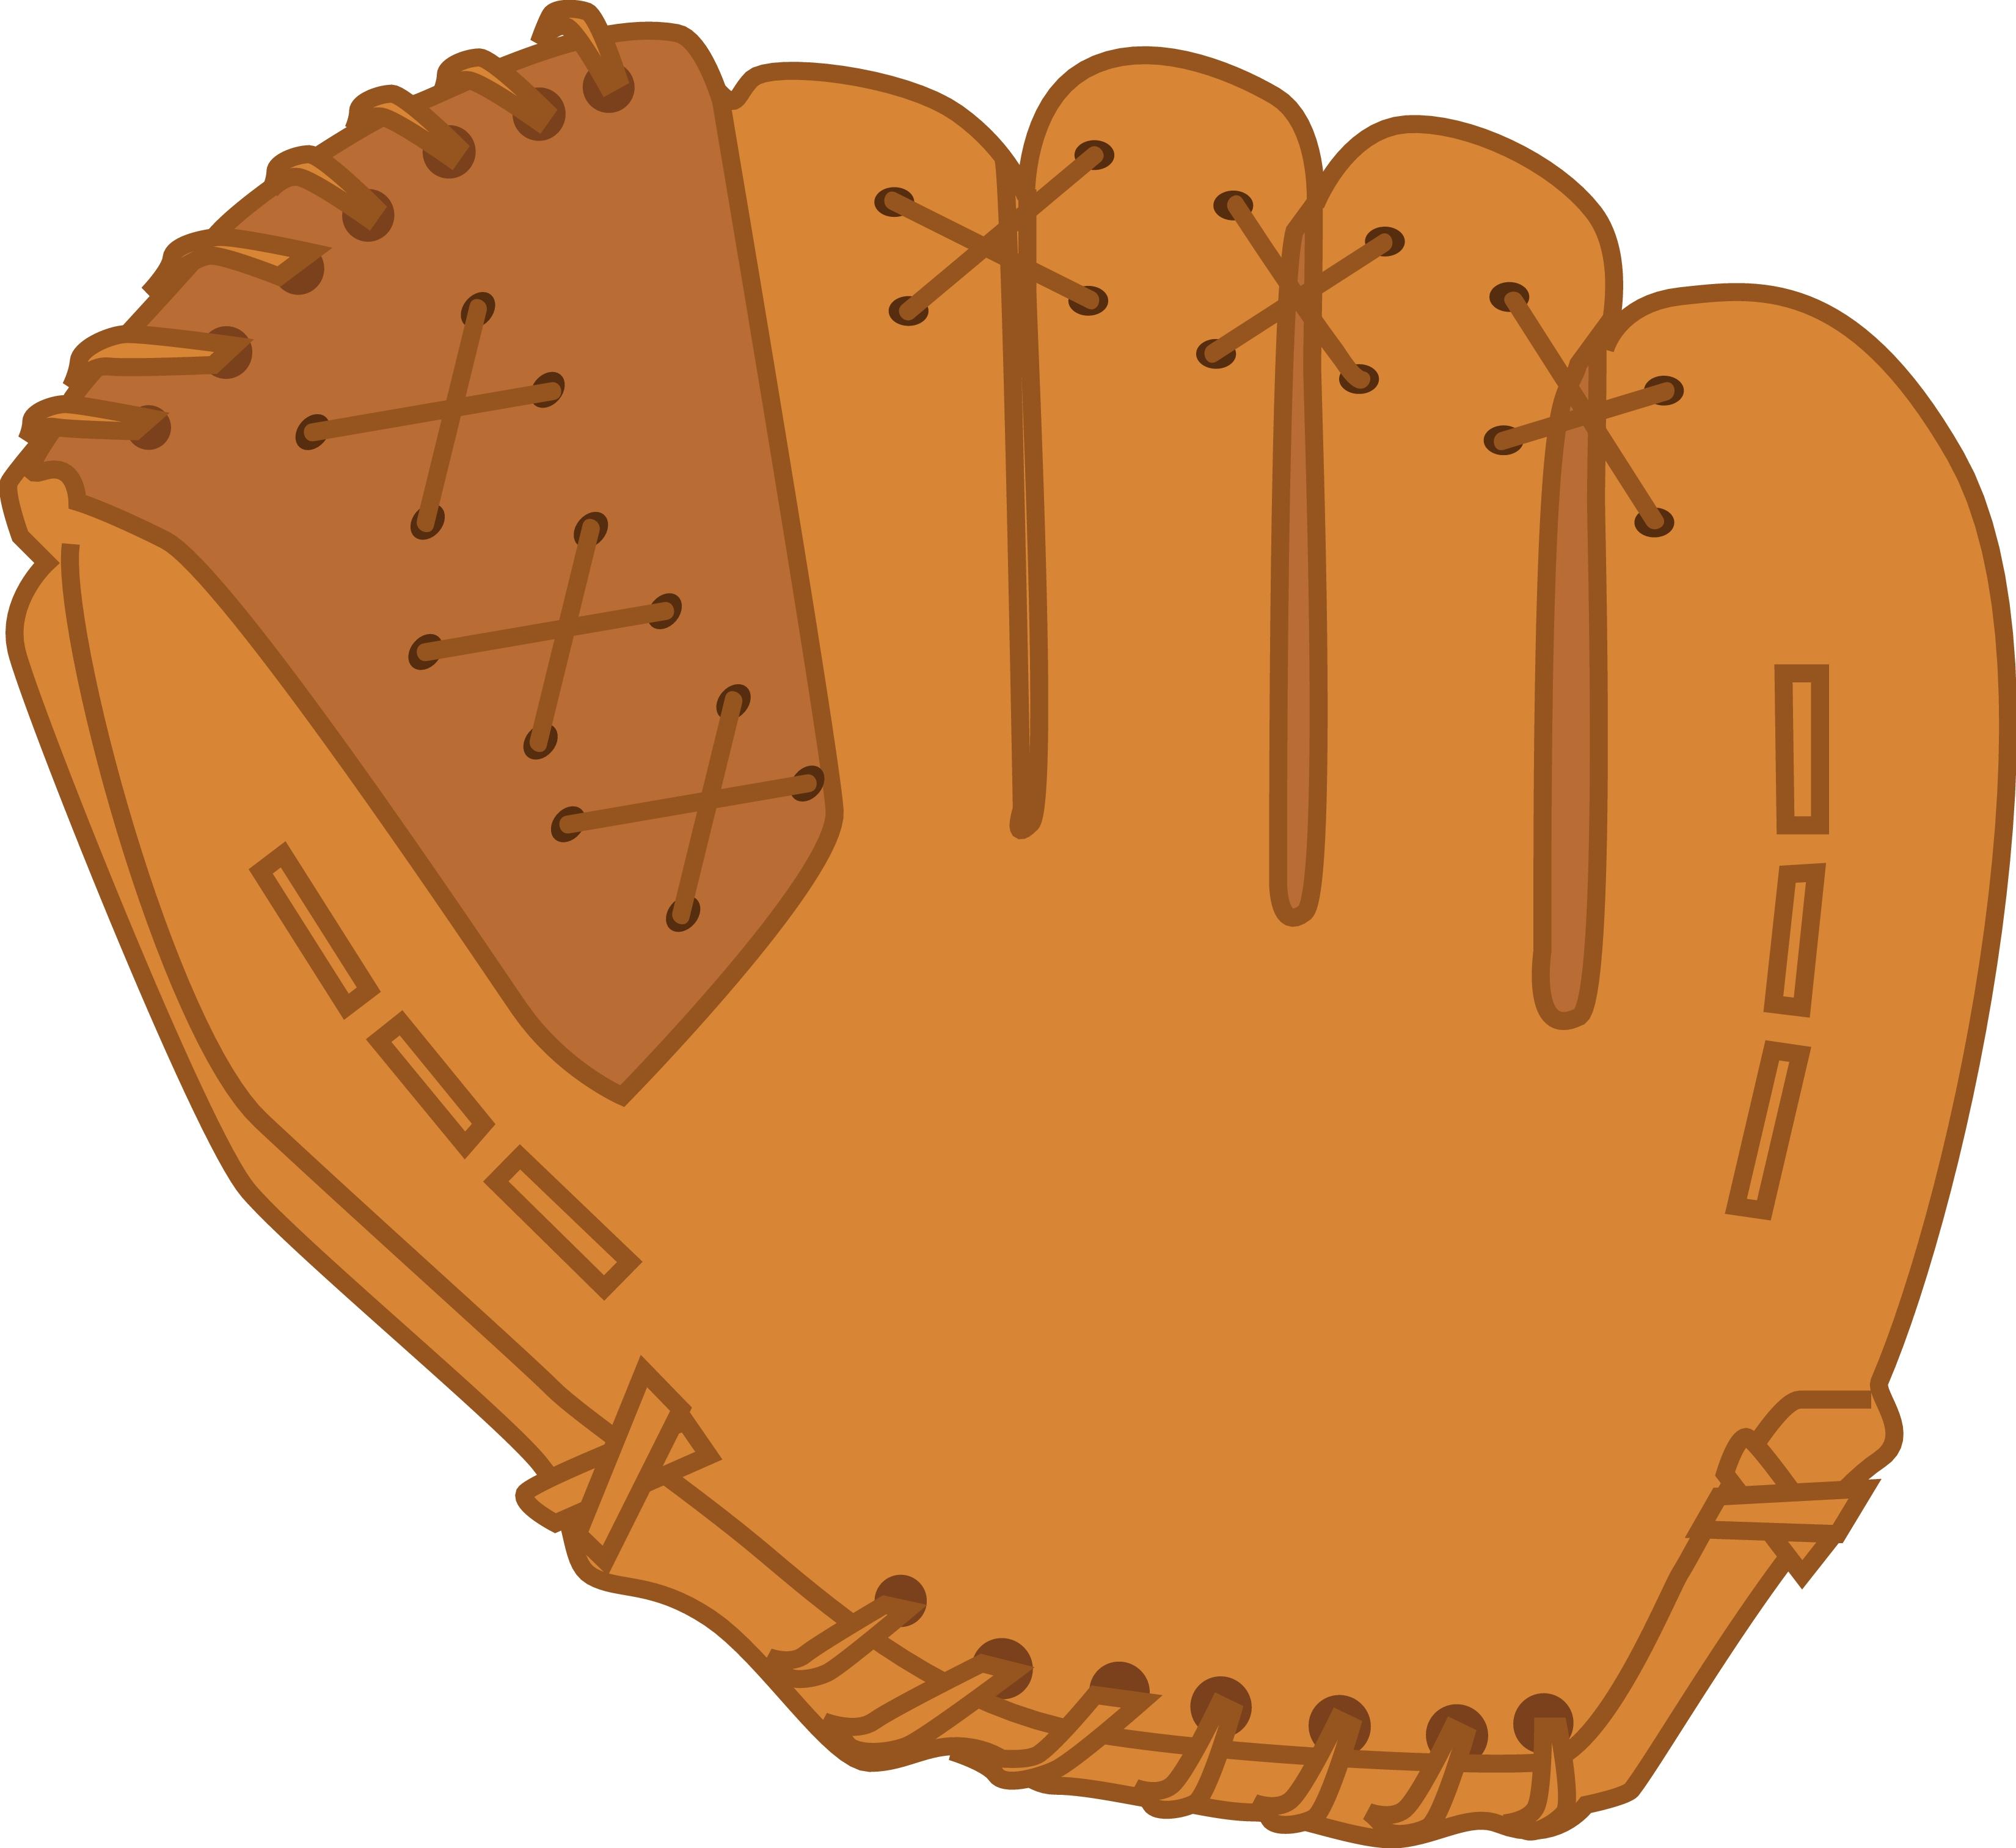 Baseball clipart baseball glove Download art free clip free